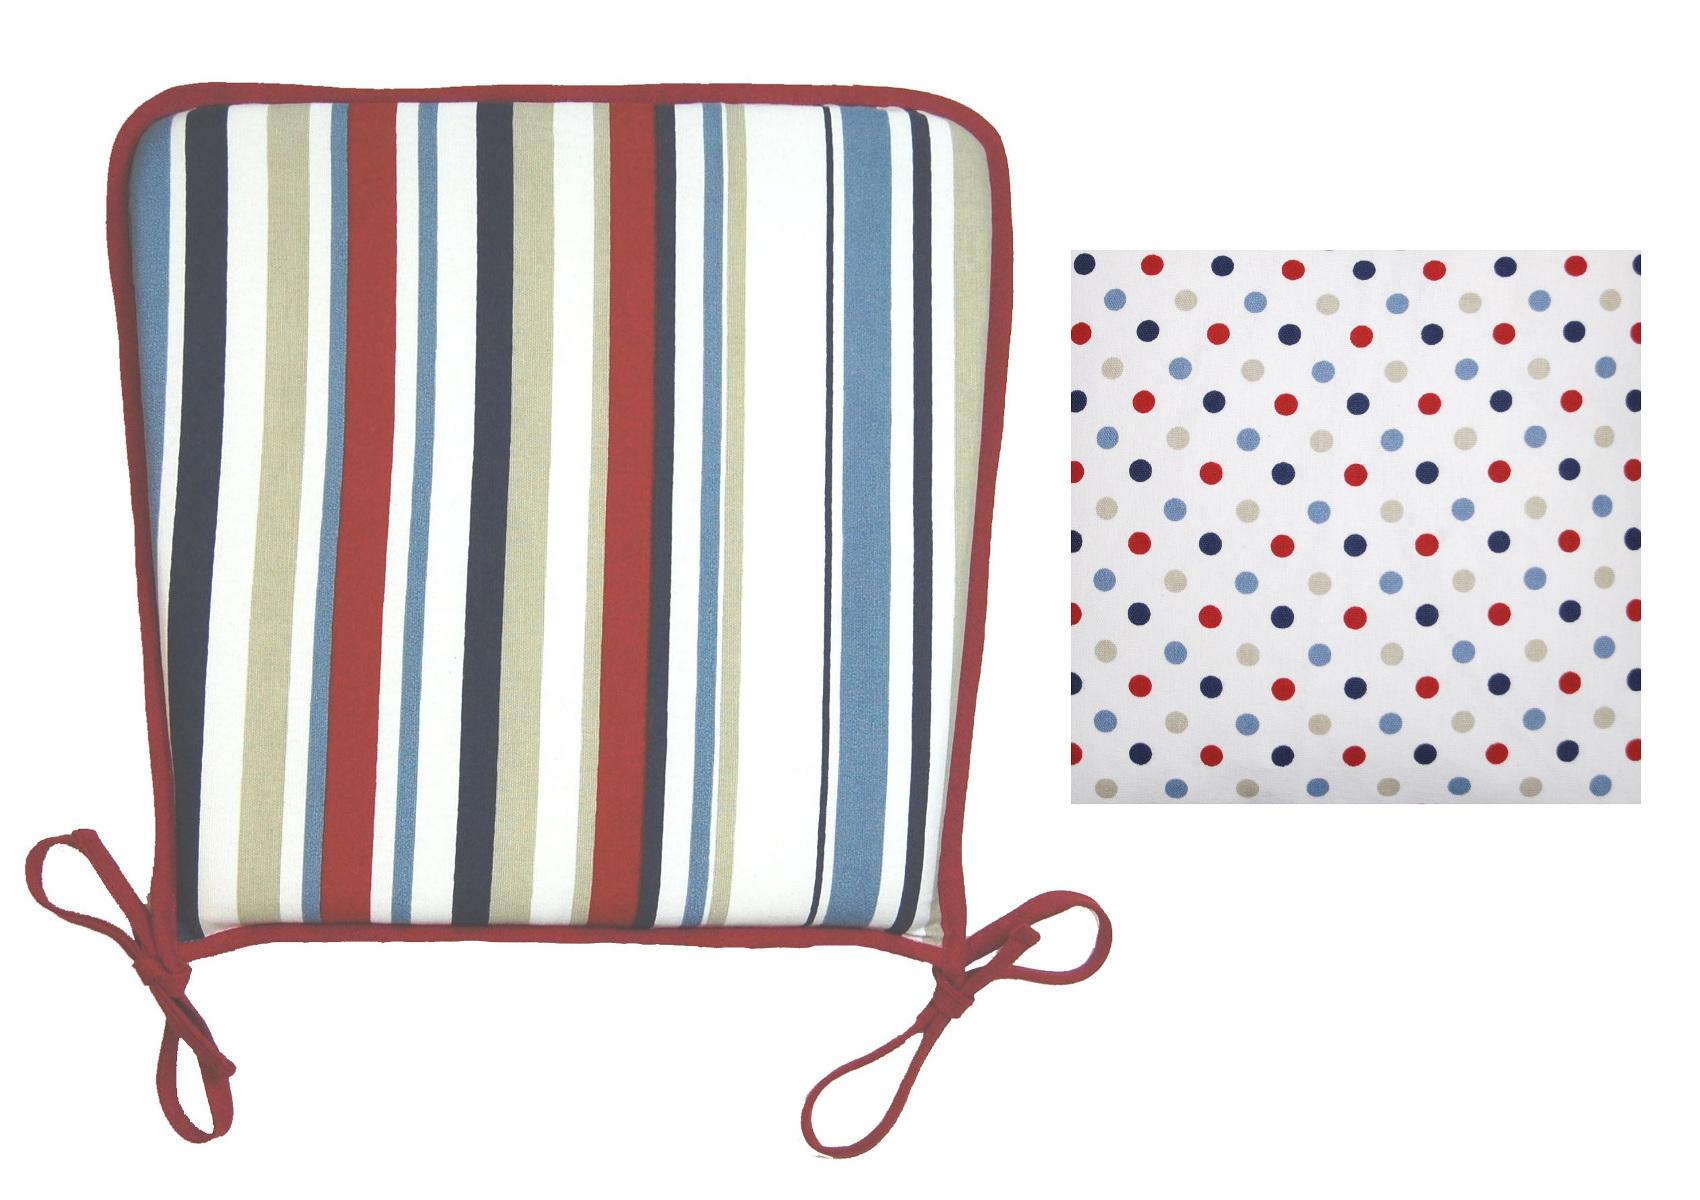 Striped Kitchen Seat Pad Polka Dot Reverse Cotton Garden Dining ...